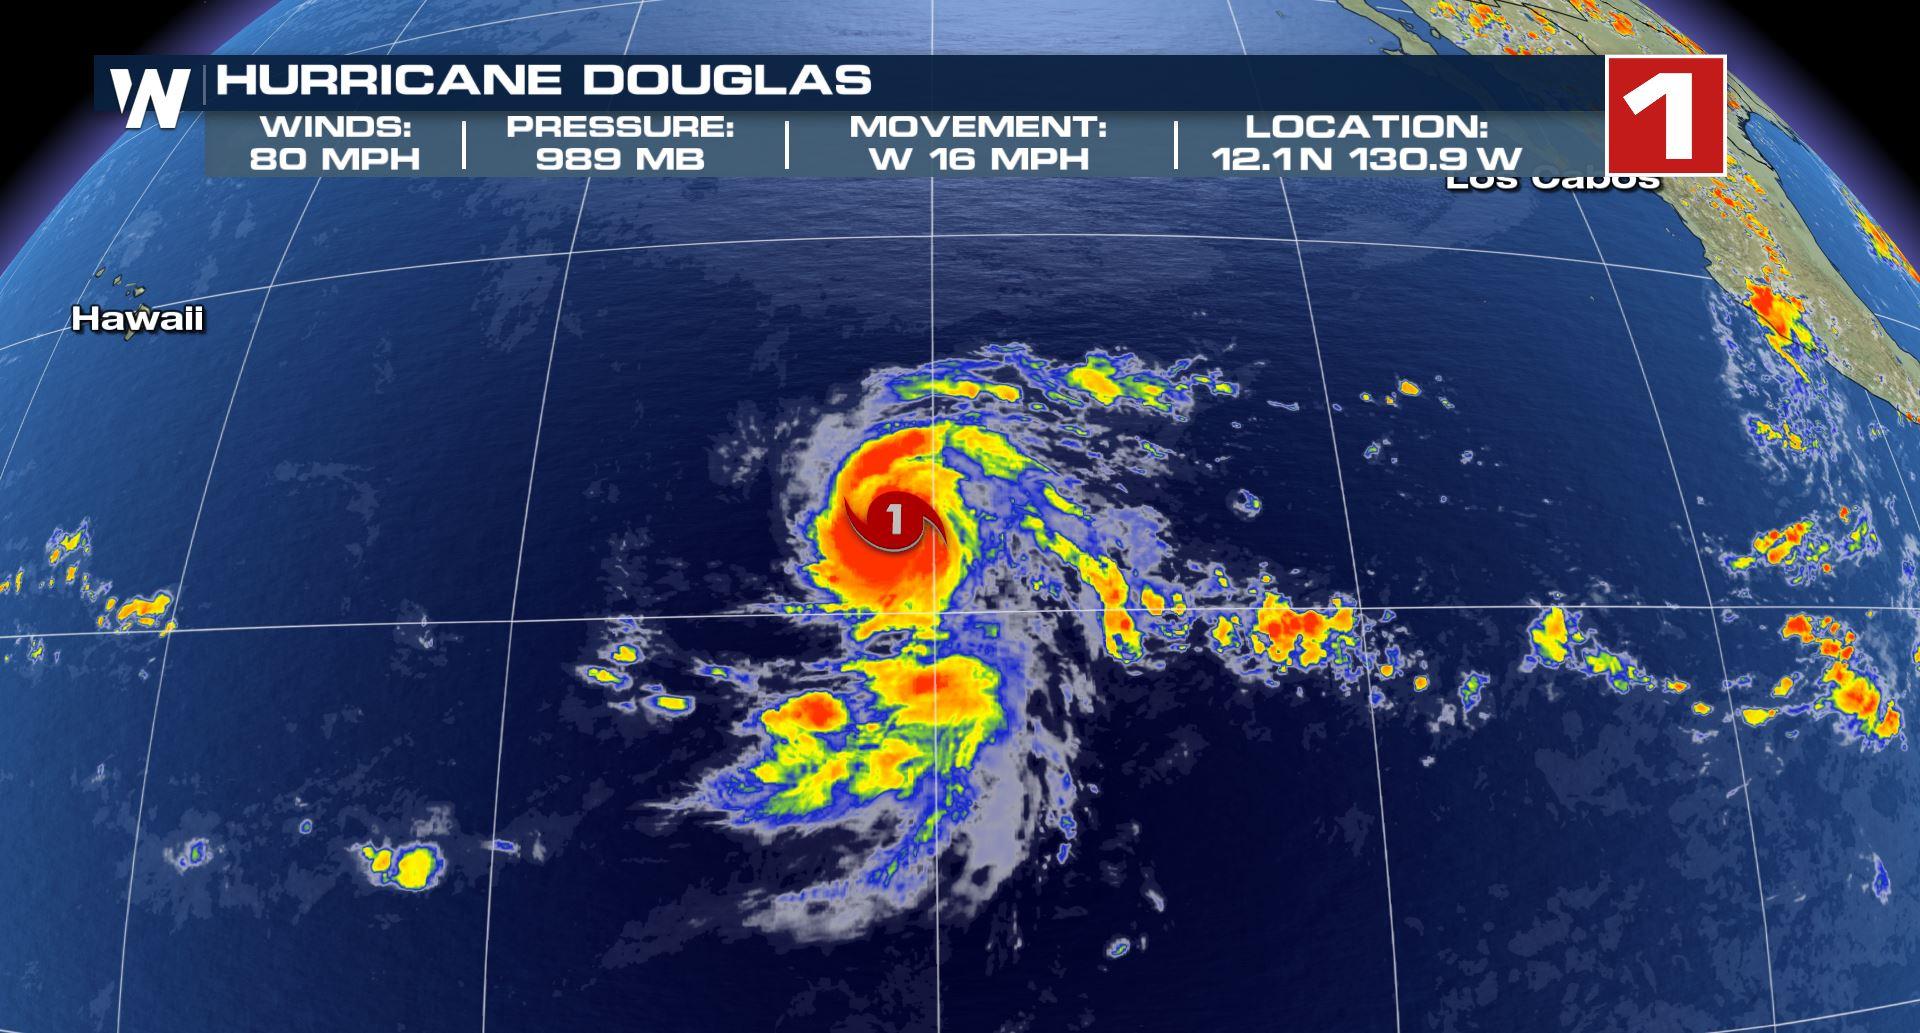 Hurricane Douglas on a path directly to Hawaii